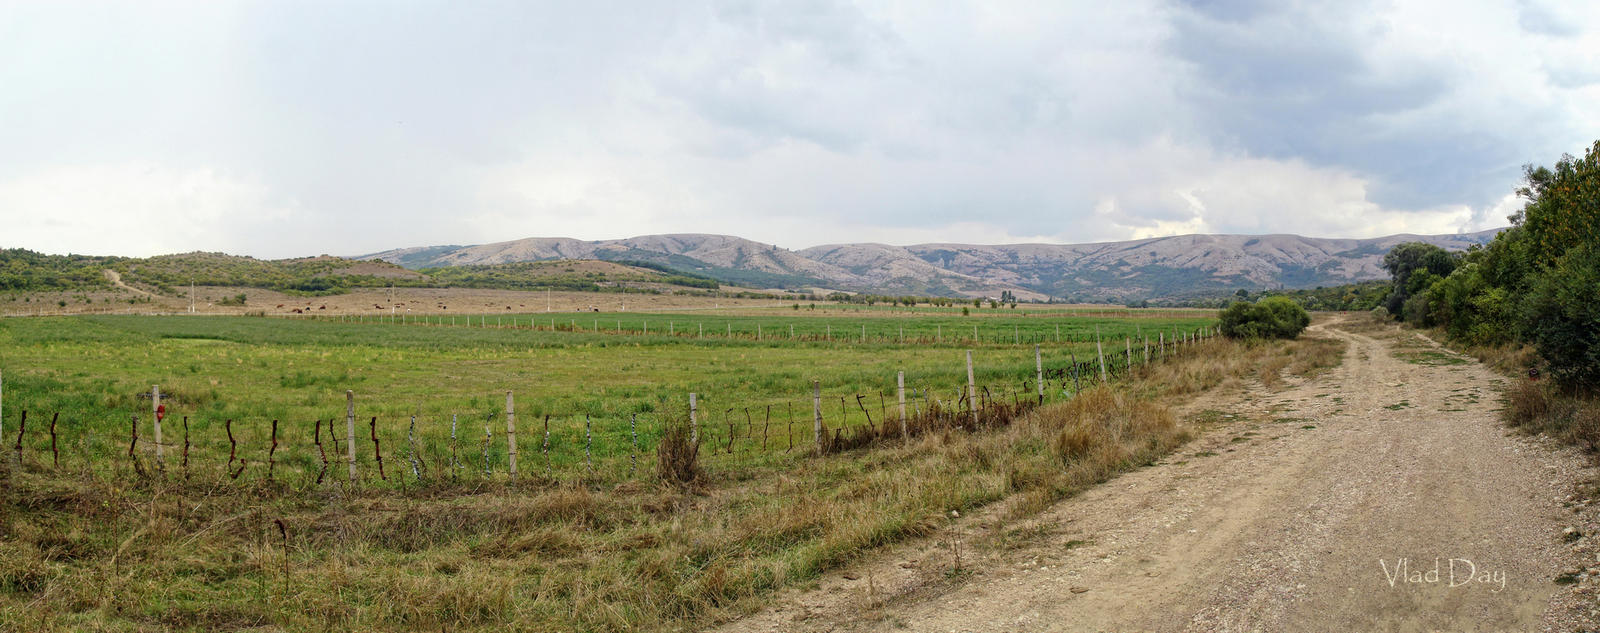 Perevalnoye village area 1, Crimea, Sept. 4, 2011 by anyword